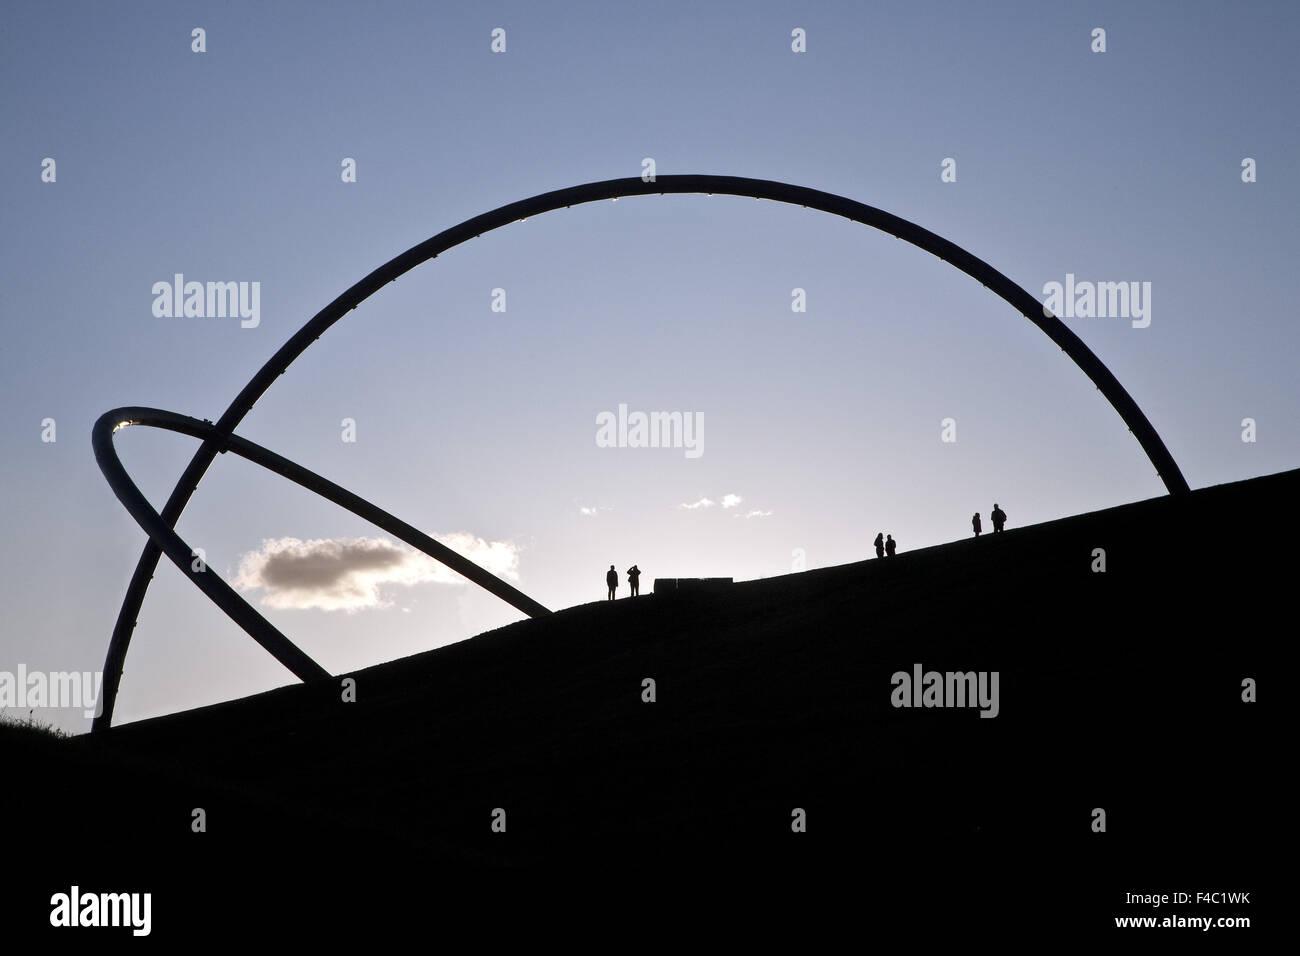 Orizzonte osservatorio, Hoheward, Herten, Germania Immagini Stock